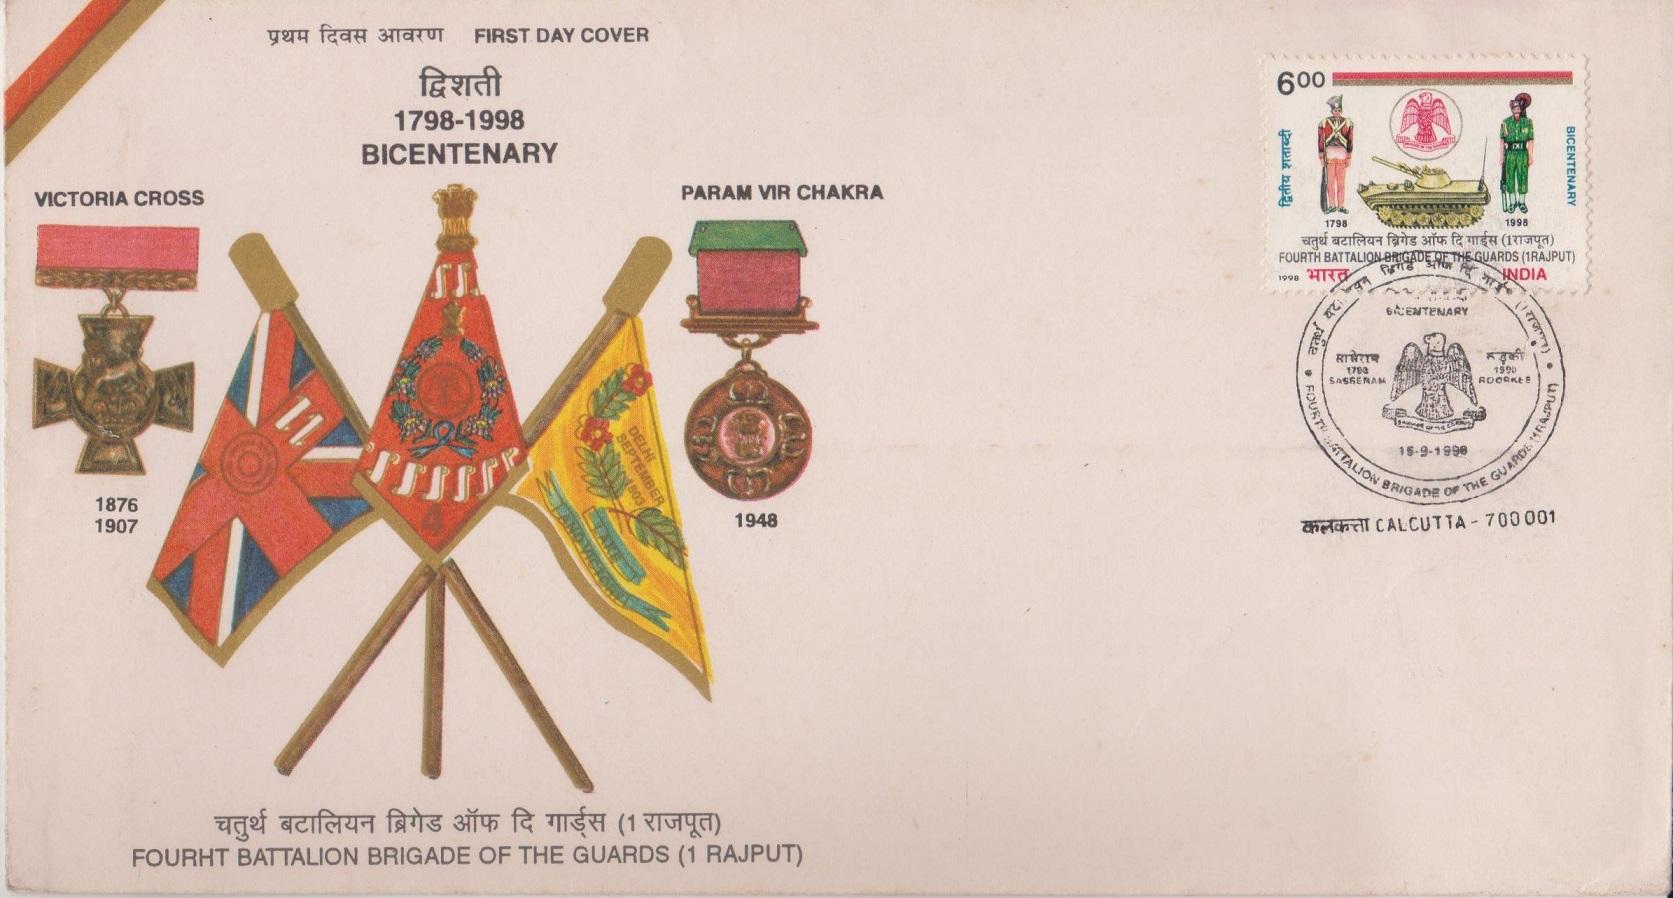 Victoria Cross, Param Vir Chakra